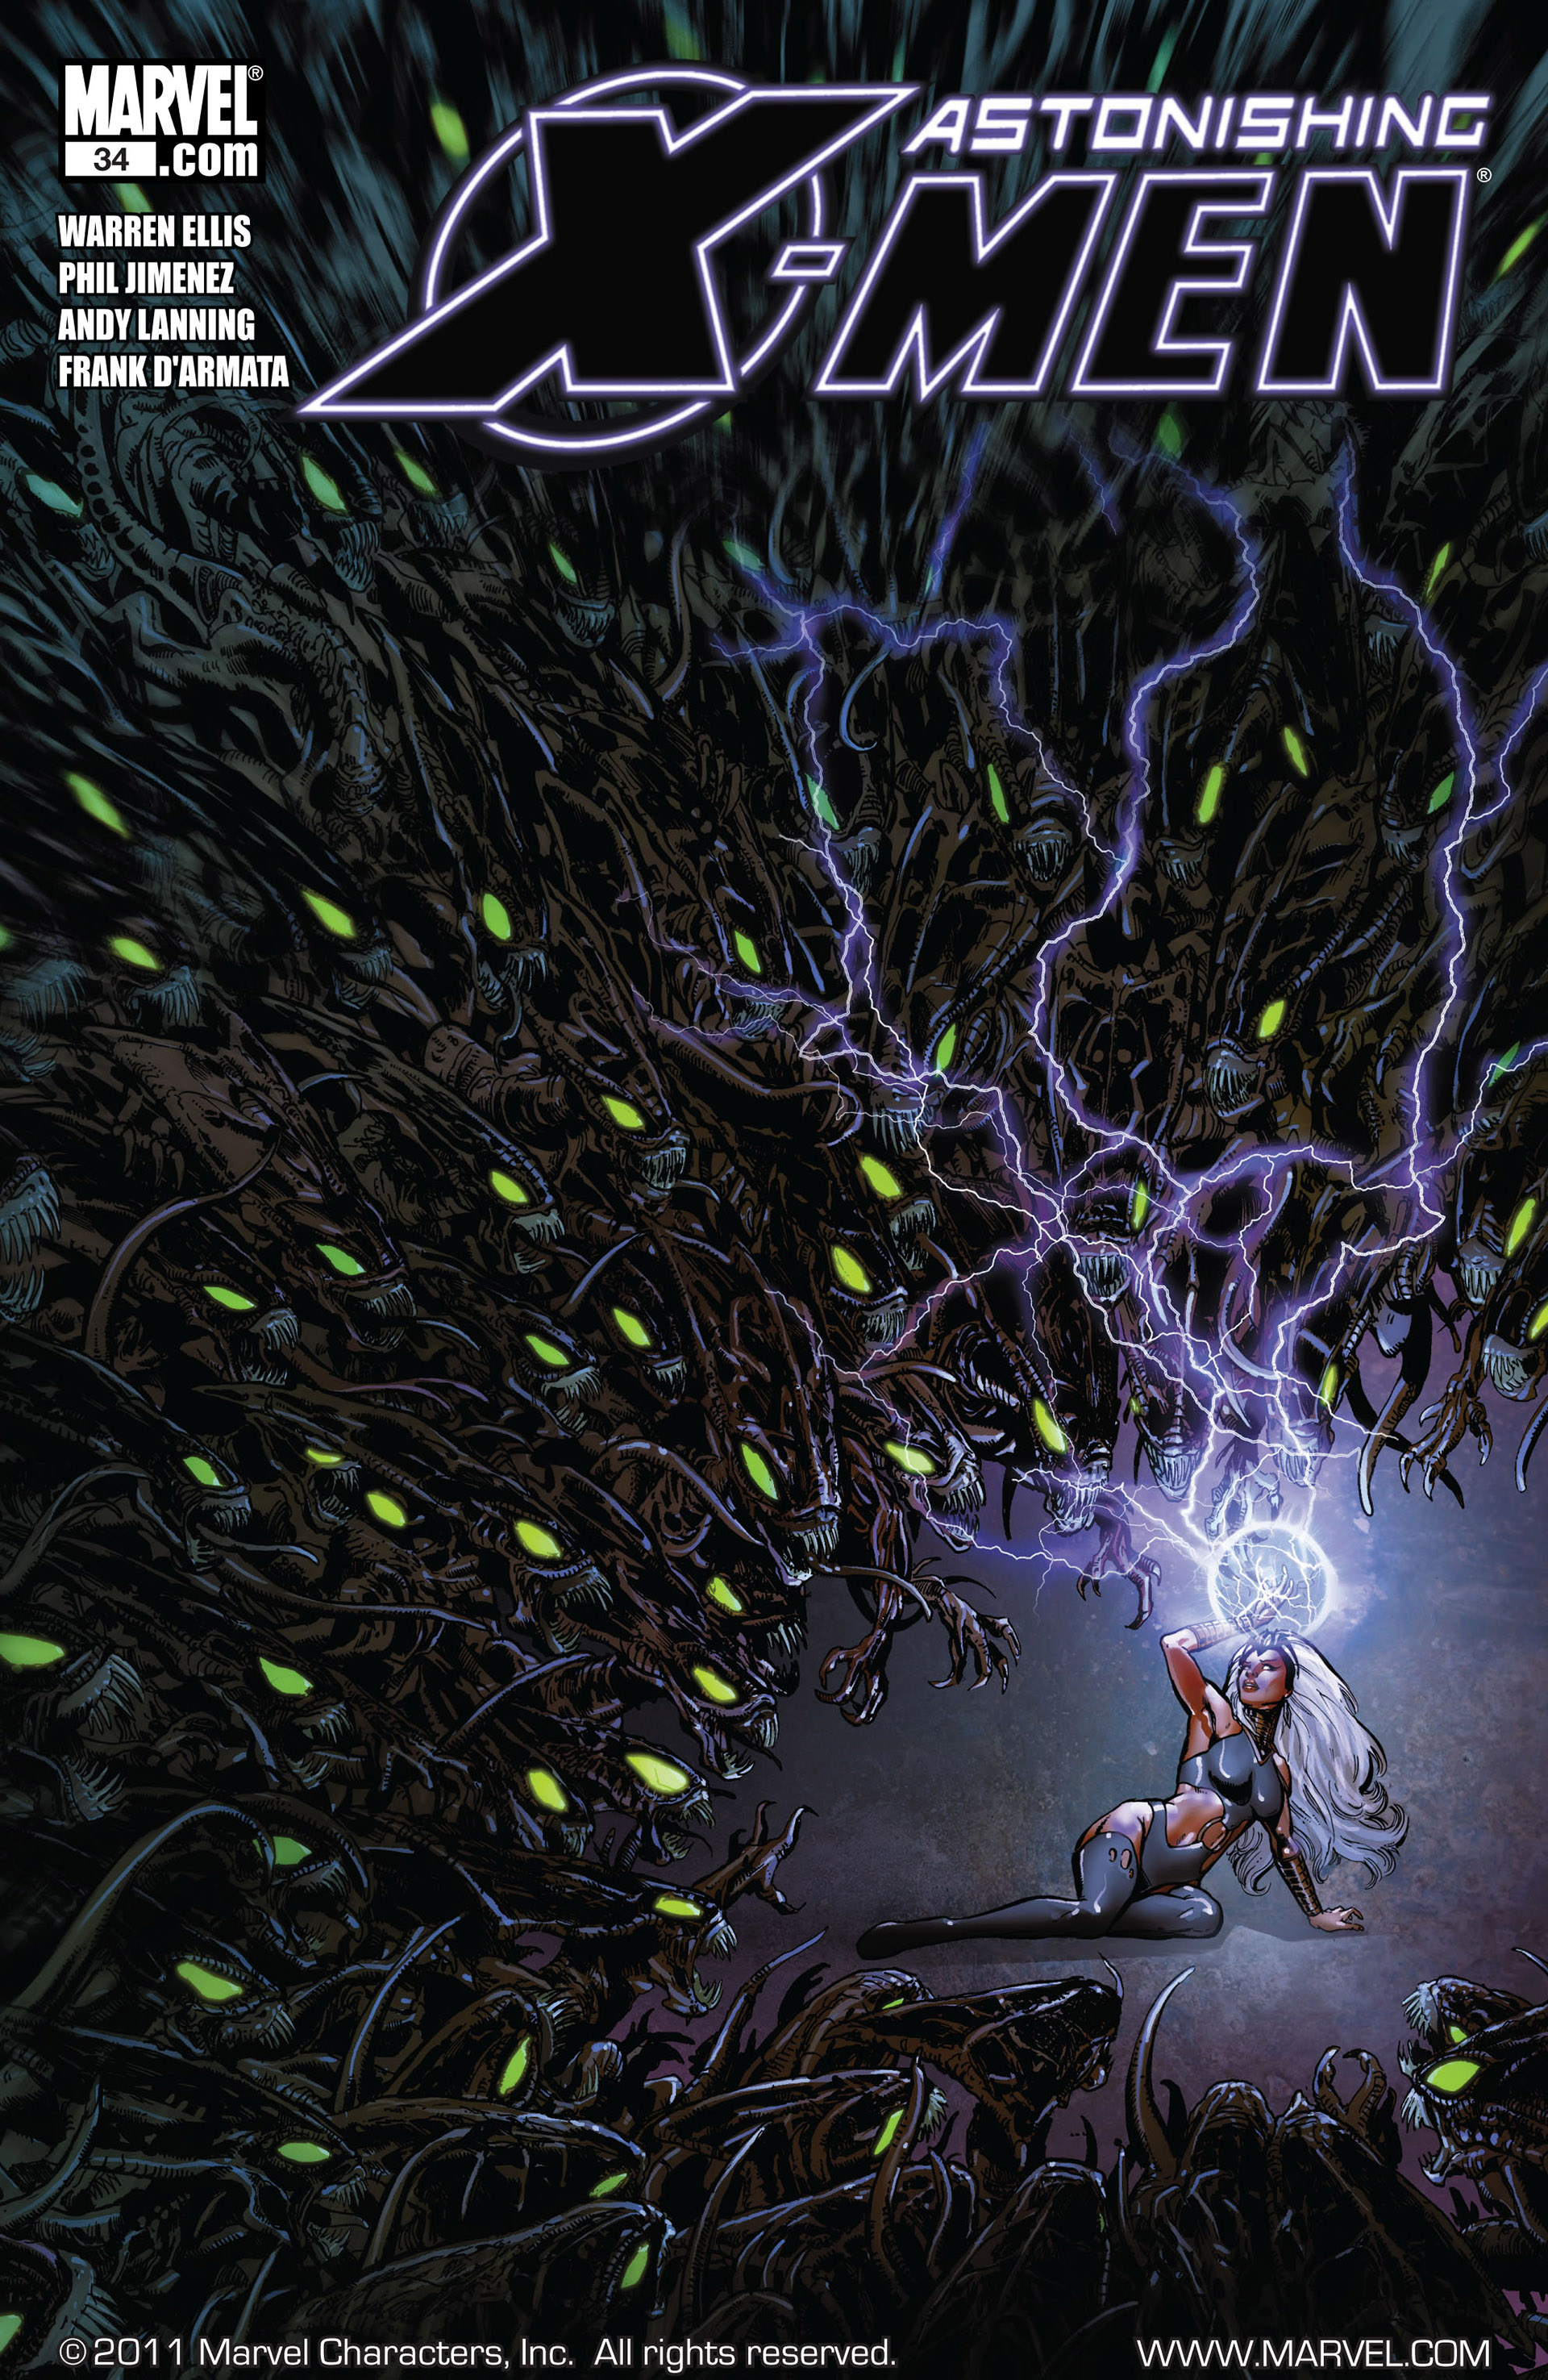 Read online Astonishing X-Men (2004) comic -  Issue #34 - 1